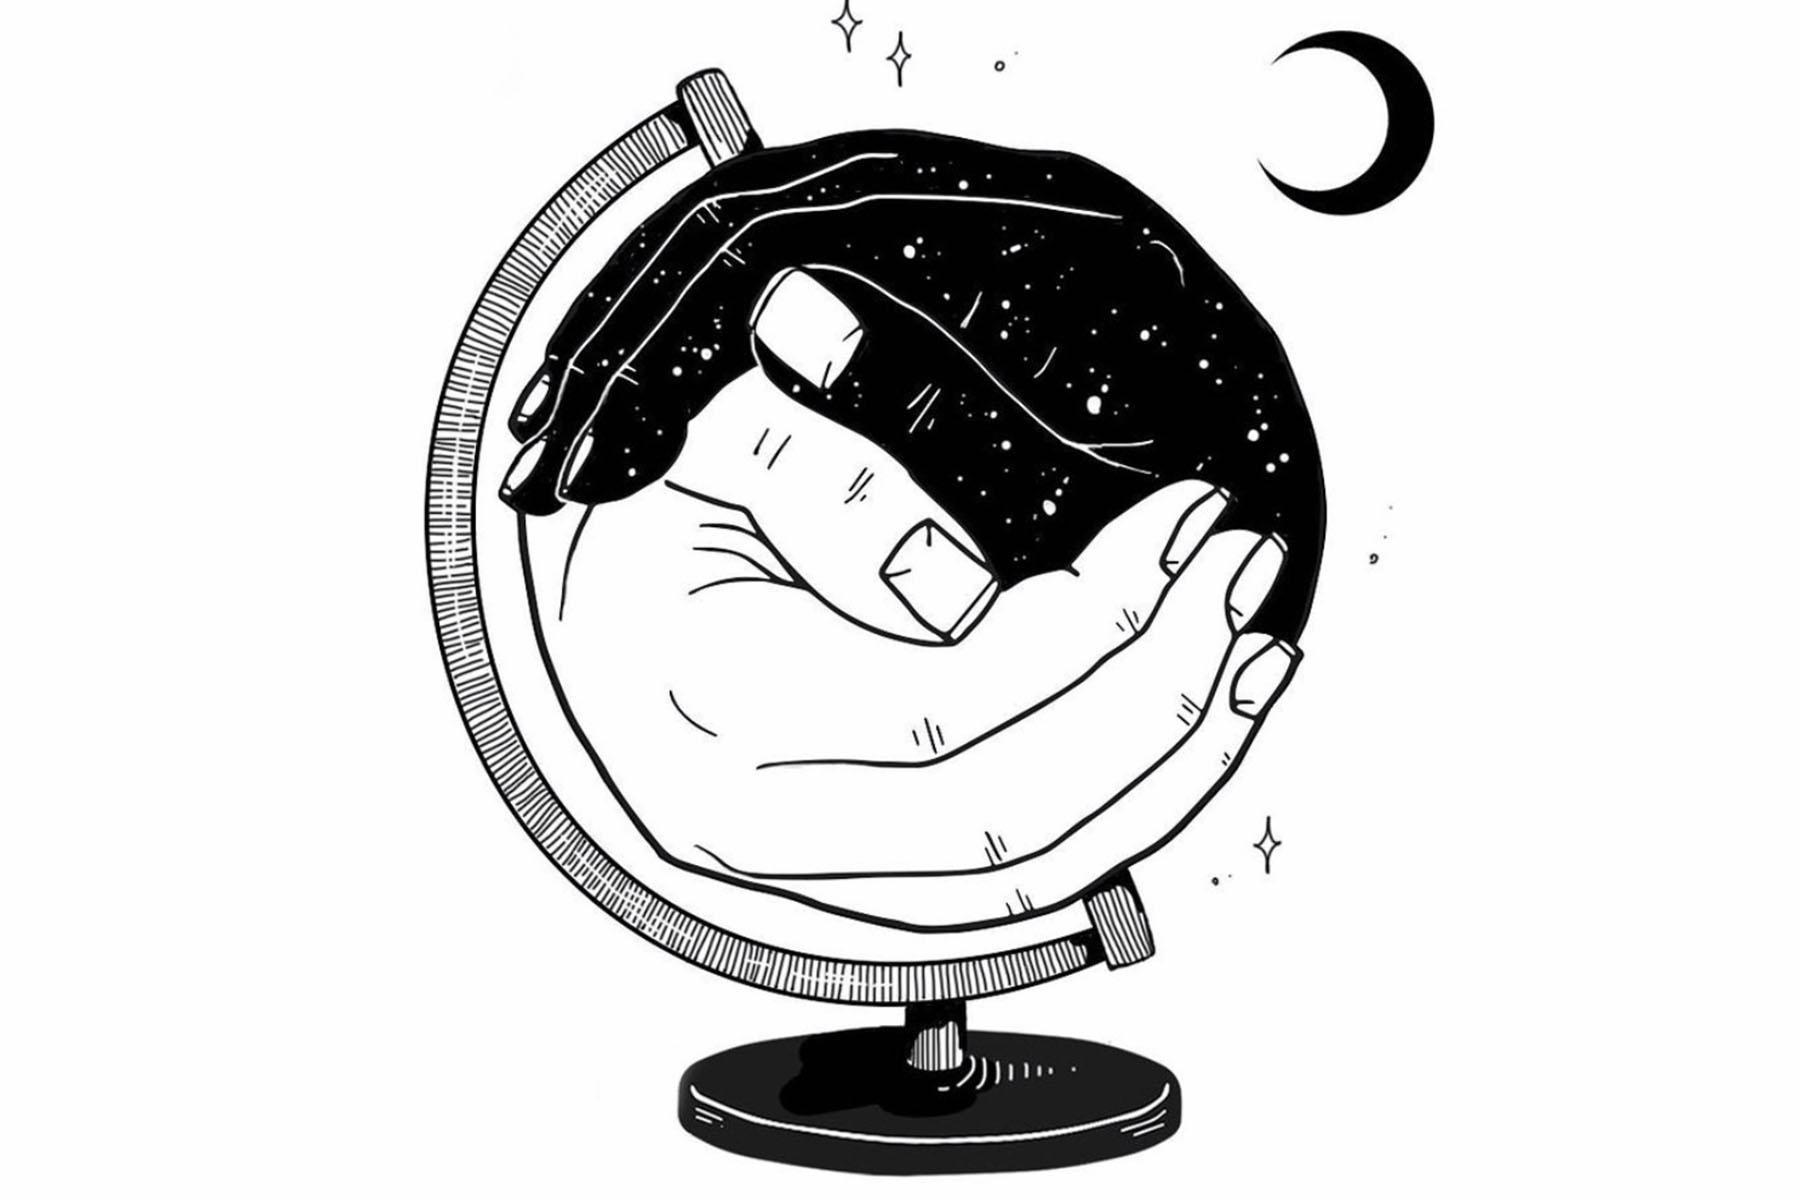 Weekly Horoscope: November 30 – December 6, 2020